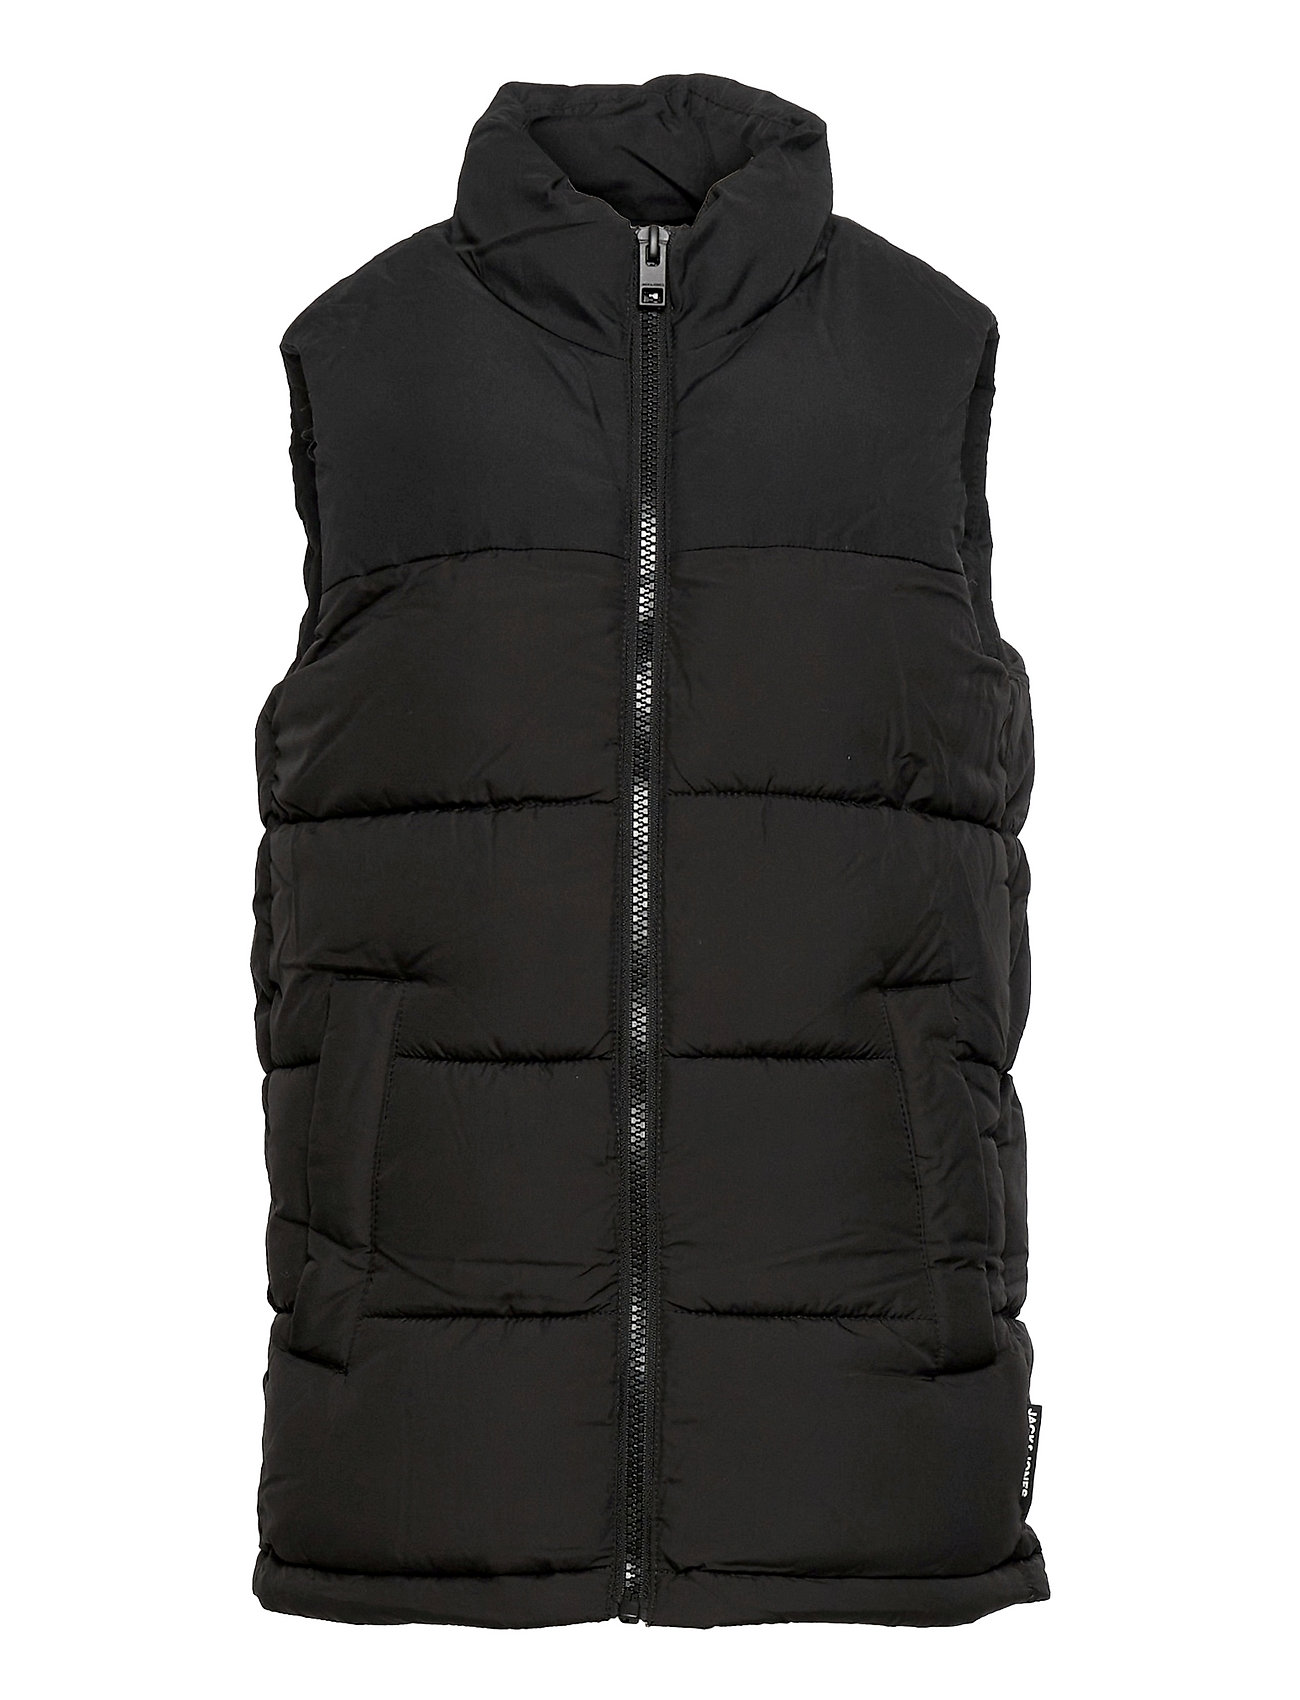 Jjpaul Bodywarmer Collar Jr Foret Vest Sort Jack & J S